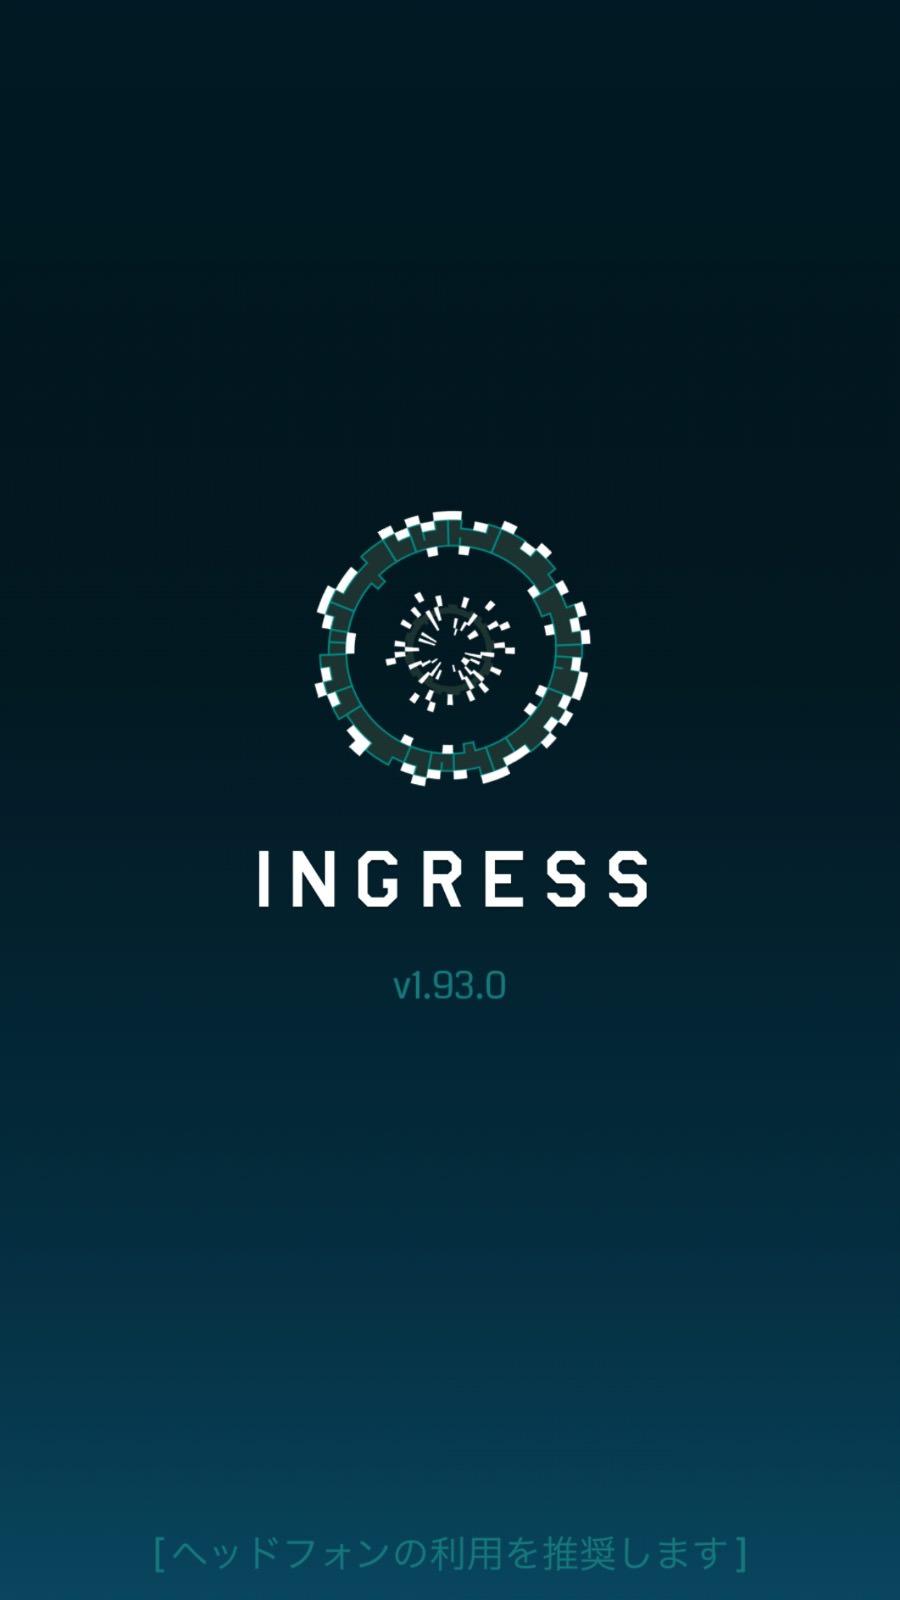 【Ingress】iOS版「Ingress 1.93.0」リリース → カプセル内でのアイテムの一括選択の方法が変更